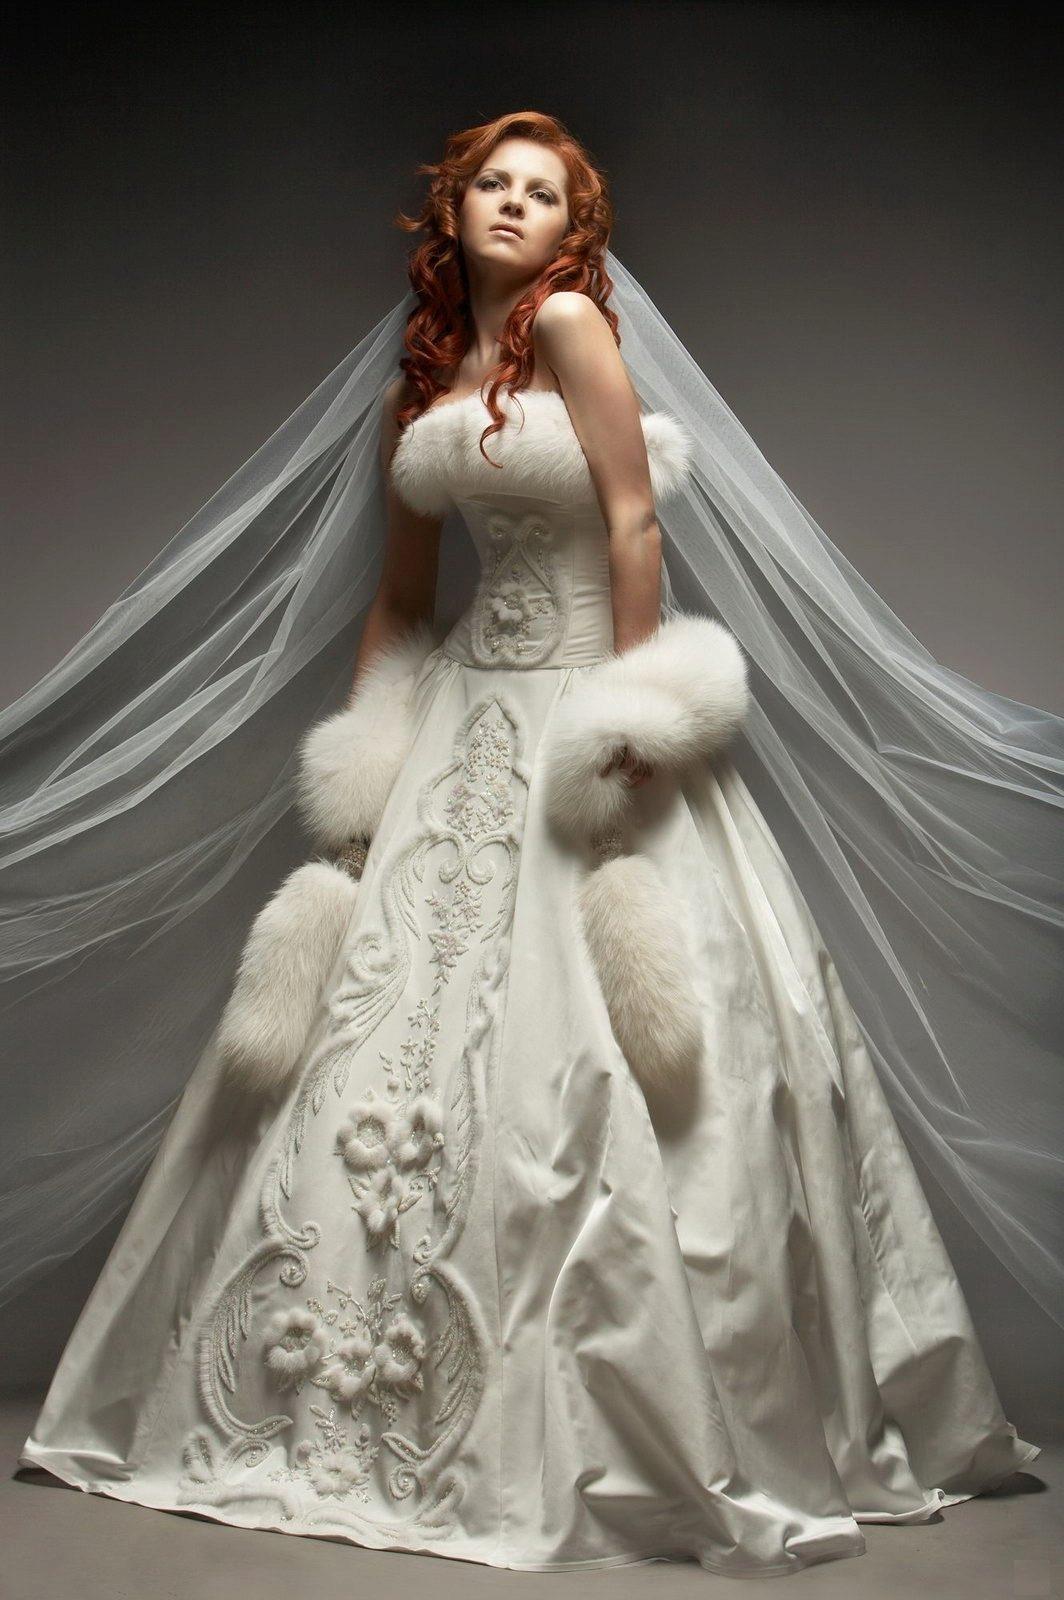 svadebnoe-plate-v-russkom-narodnom-stile-34